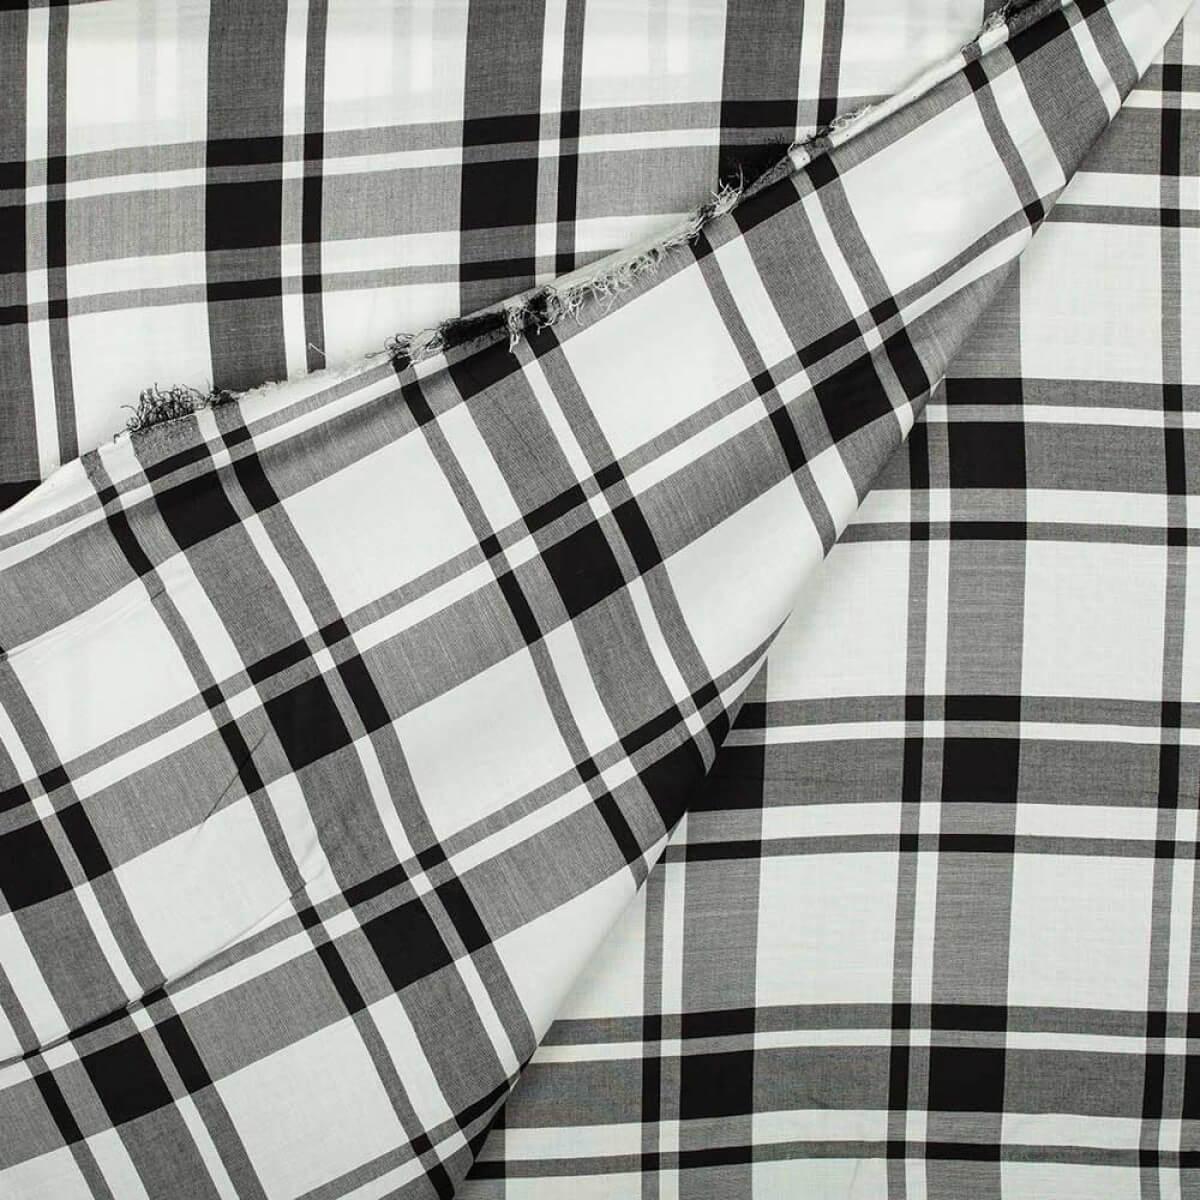 Tissu viscose carreaux noir blanc merceriecar for Tissu a carreaux